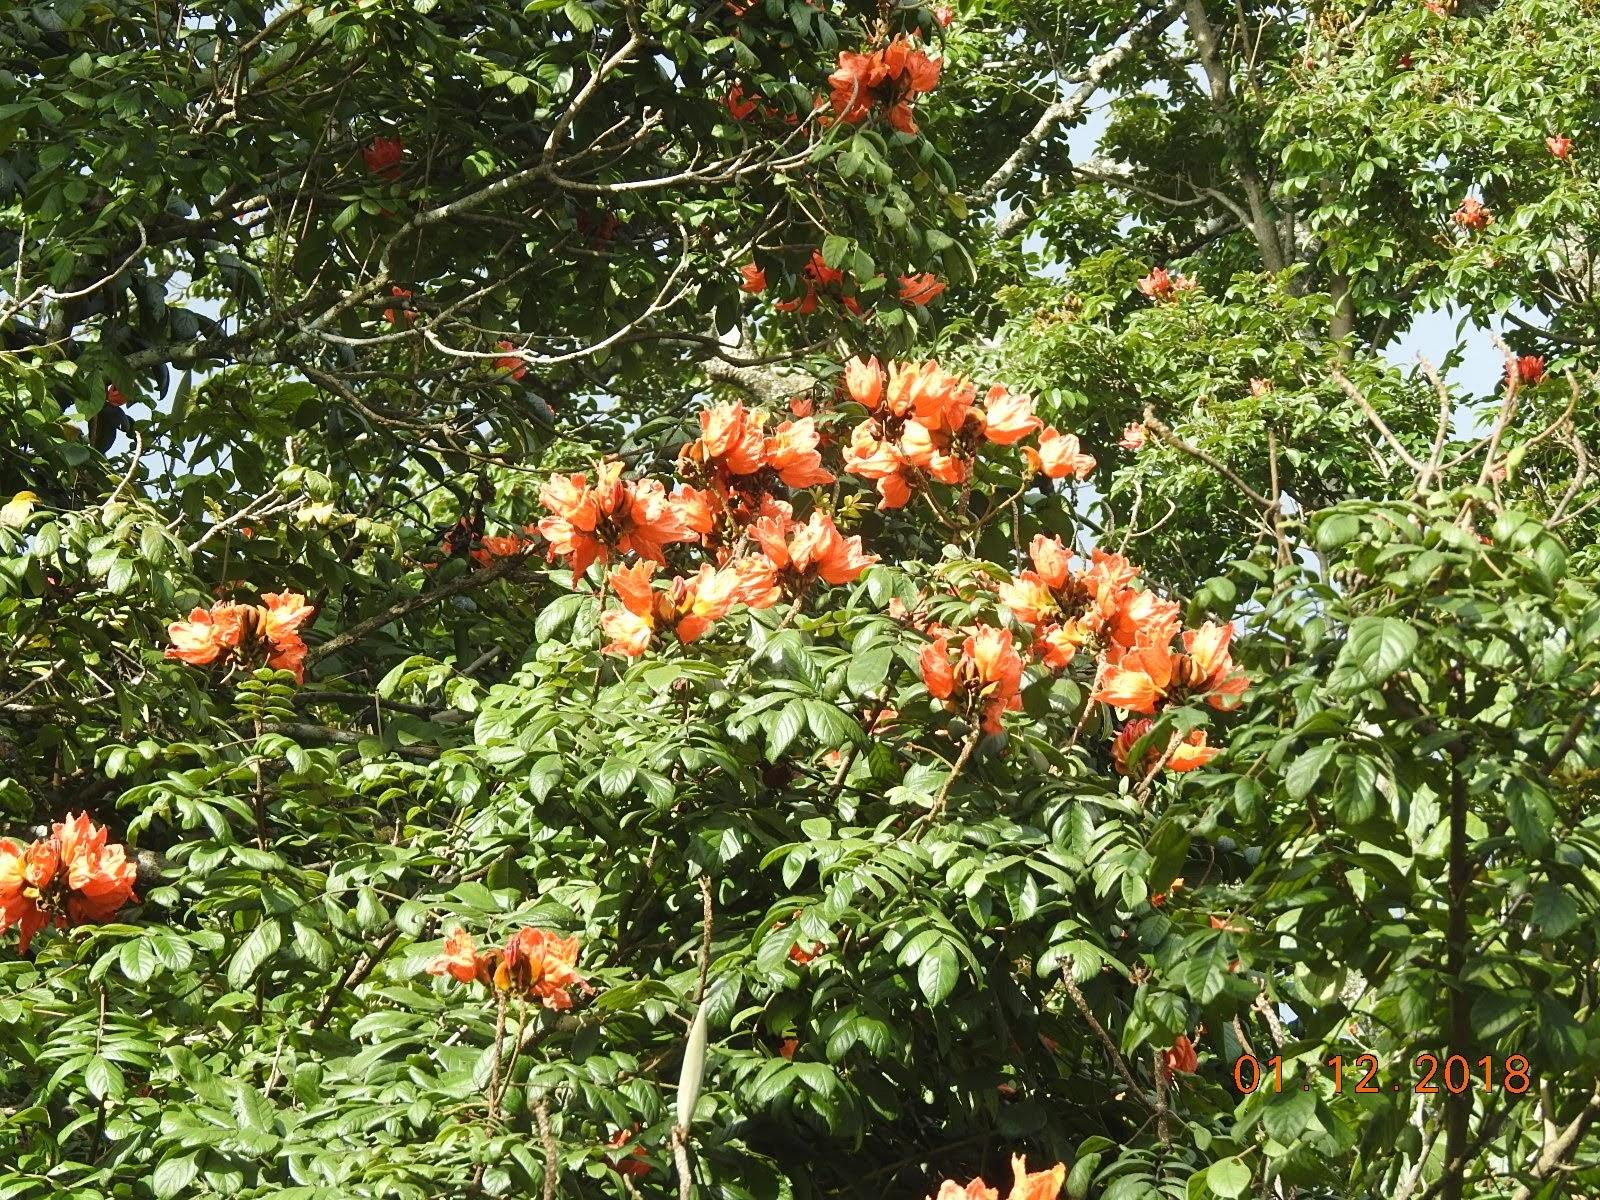 invite-to-paradise-sri-lanka-maldives-holiday-specialists-nutan-vidyut-patel-flora.jpg